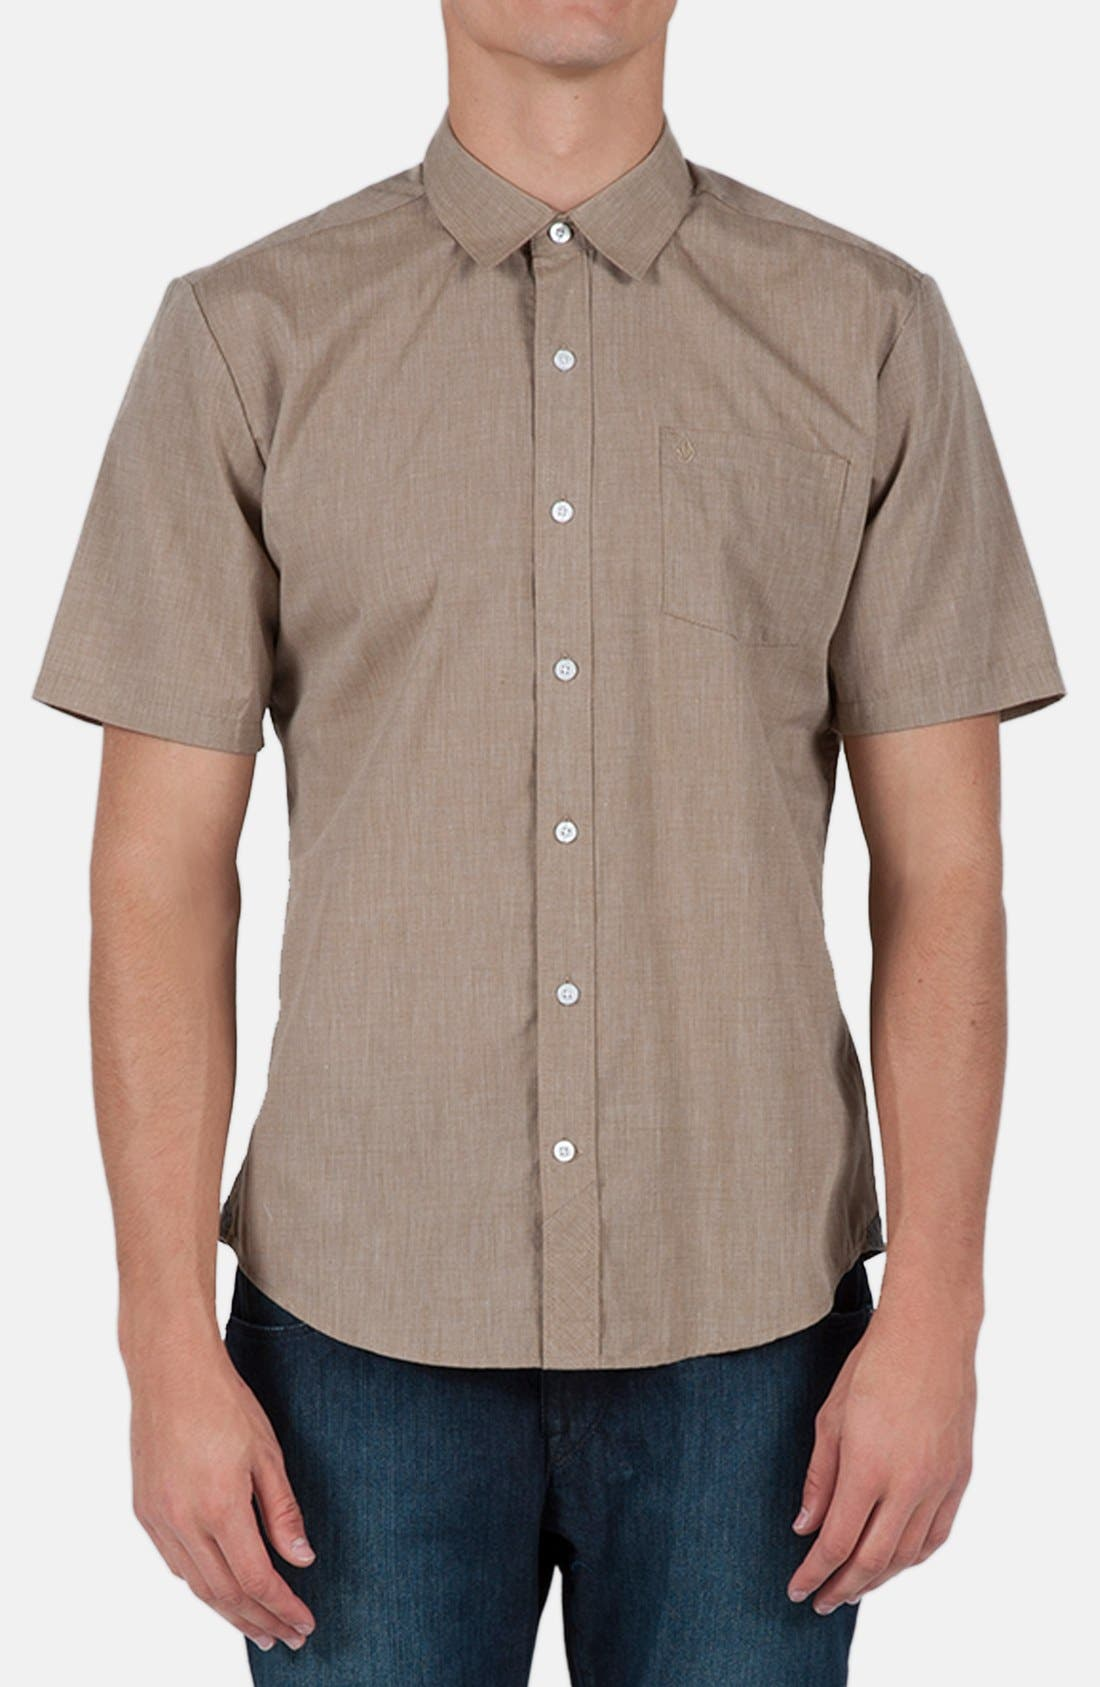 Alternate Image 1 Selected - Volcom 'Weirdoh' Trim Fit Short Sleeve Woven Shirt